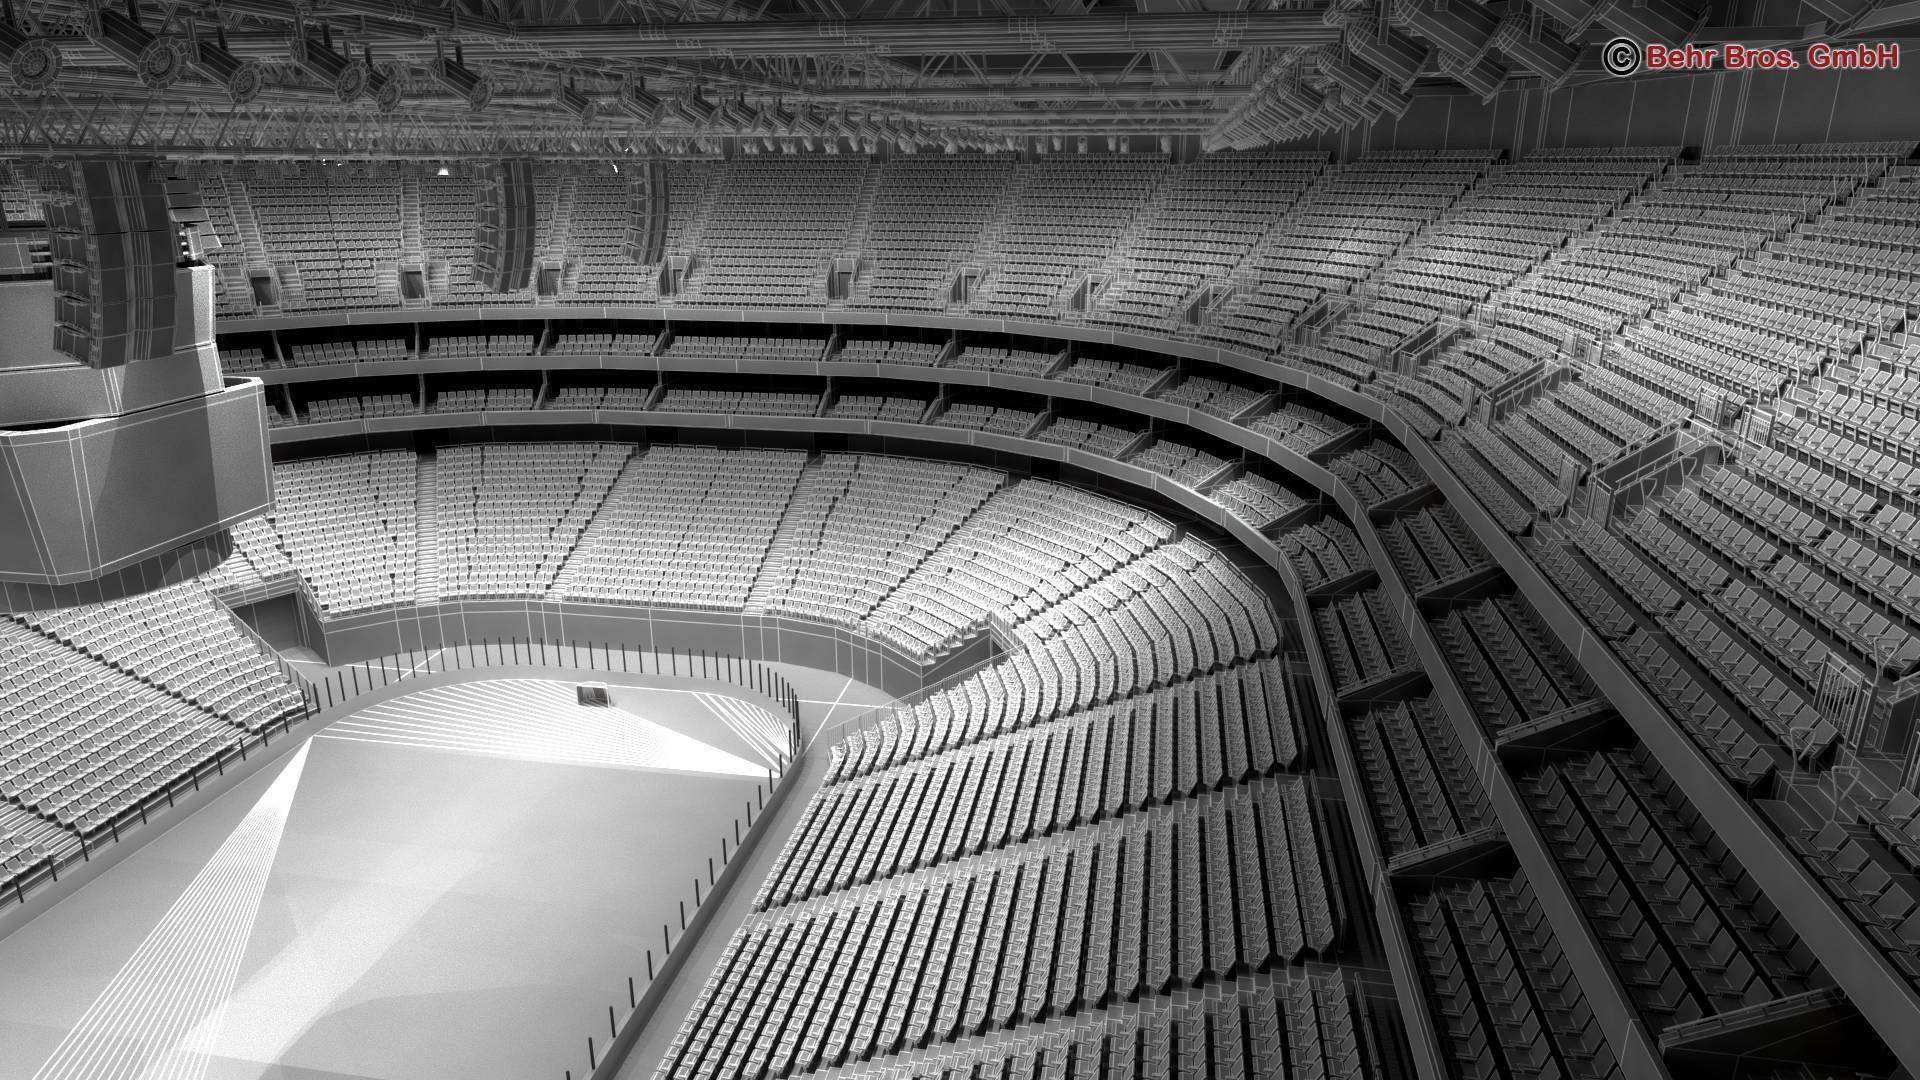 ice hockey arena v2 3d model 3ds max fbx c4d lwo ma mb obj 251665